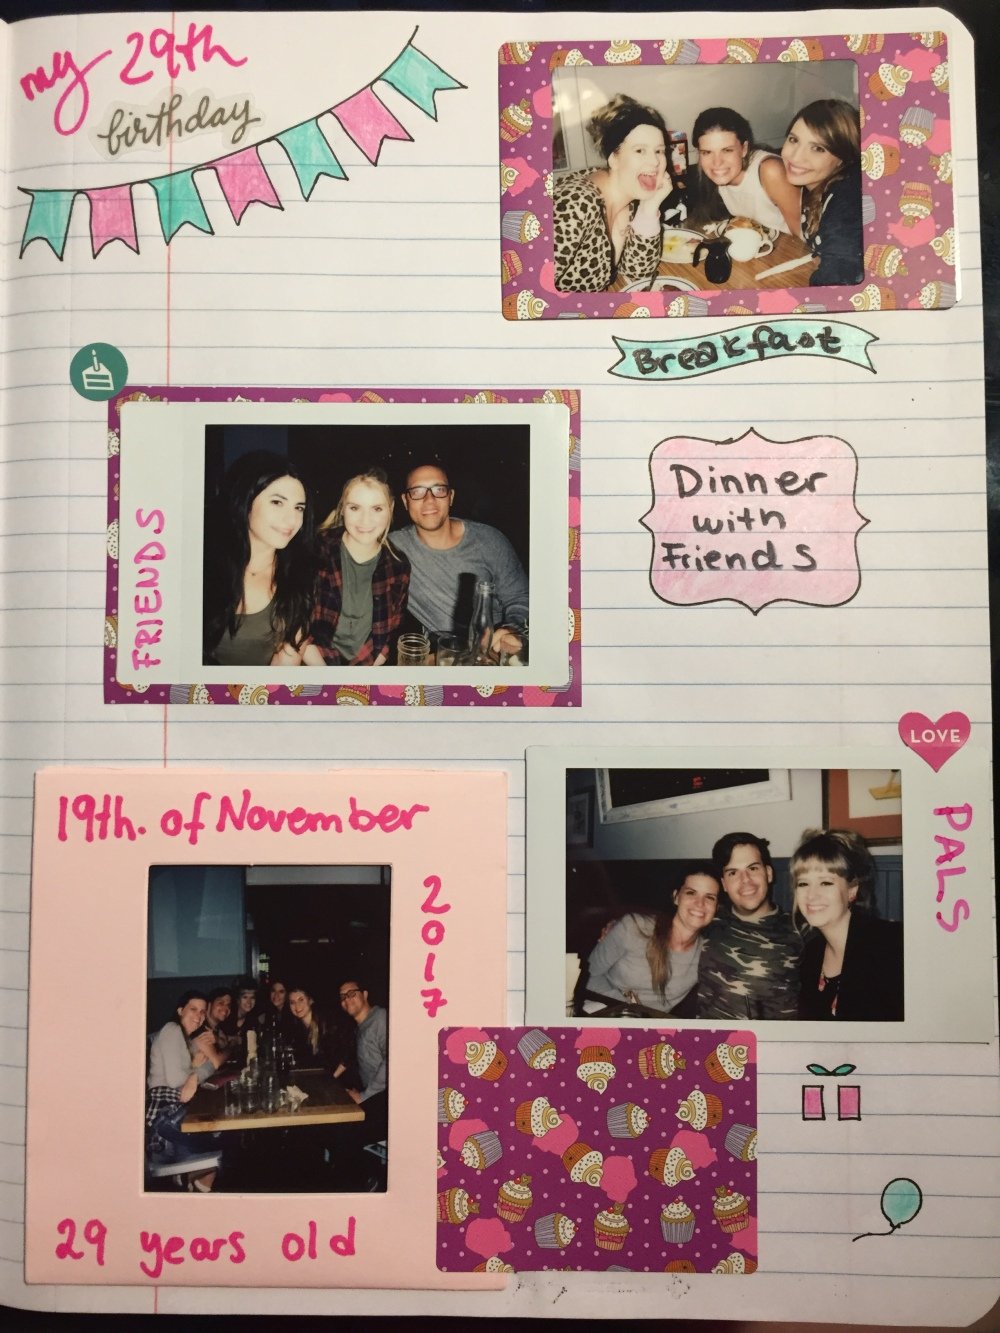 Bullet Journal Birthday Page - Birthday Polaroid Celebration